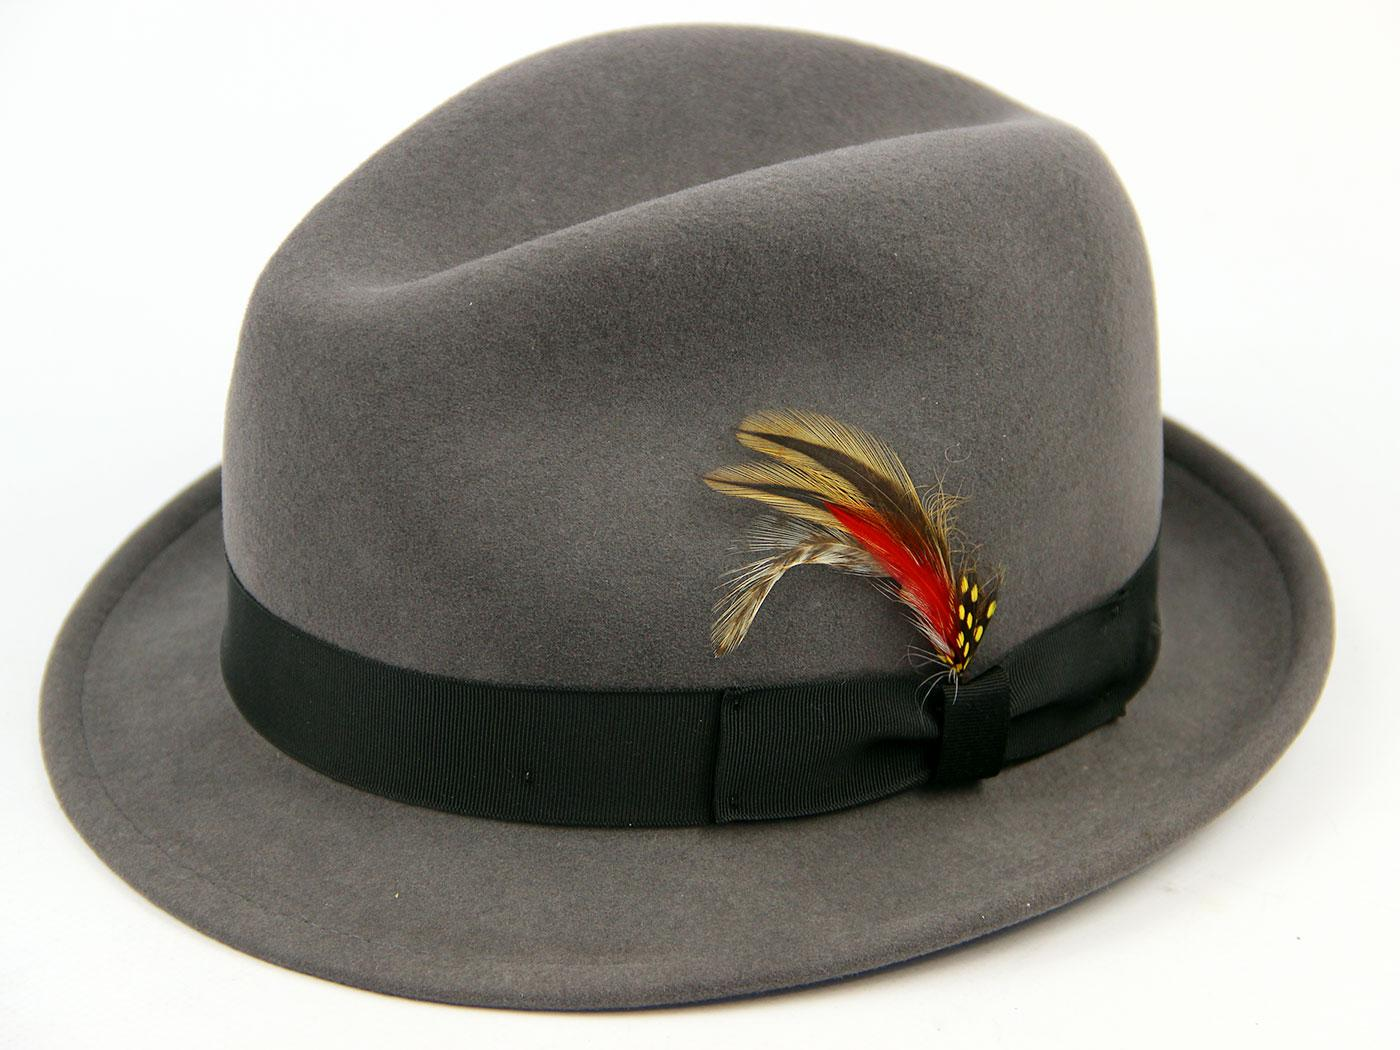 Retro Indie Mod Lite Felt Stingy Fedora Hat (Grey)